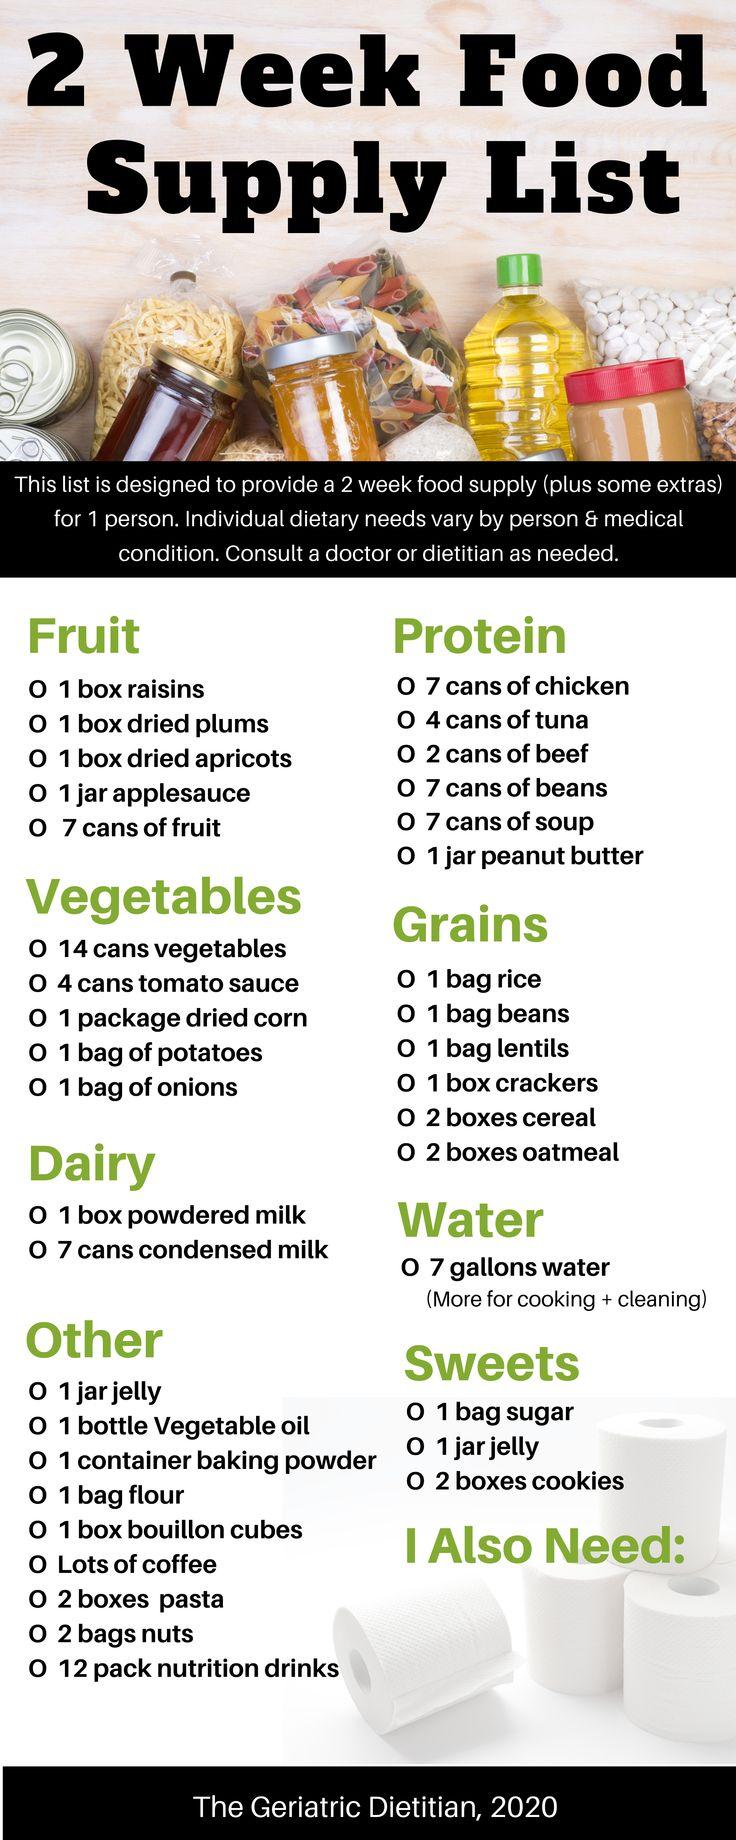 2 week food supply list for emergency or disaster